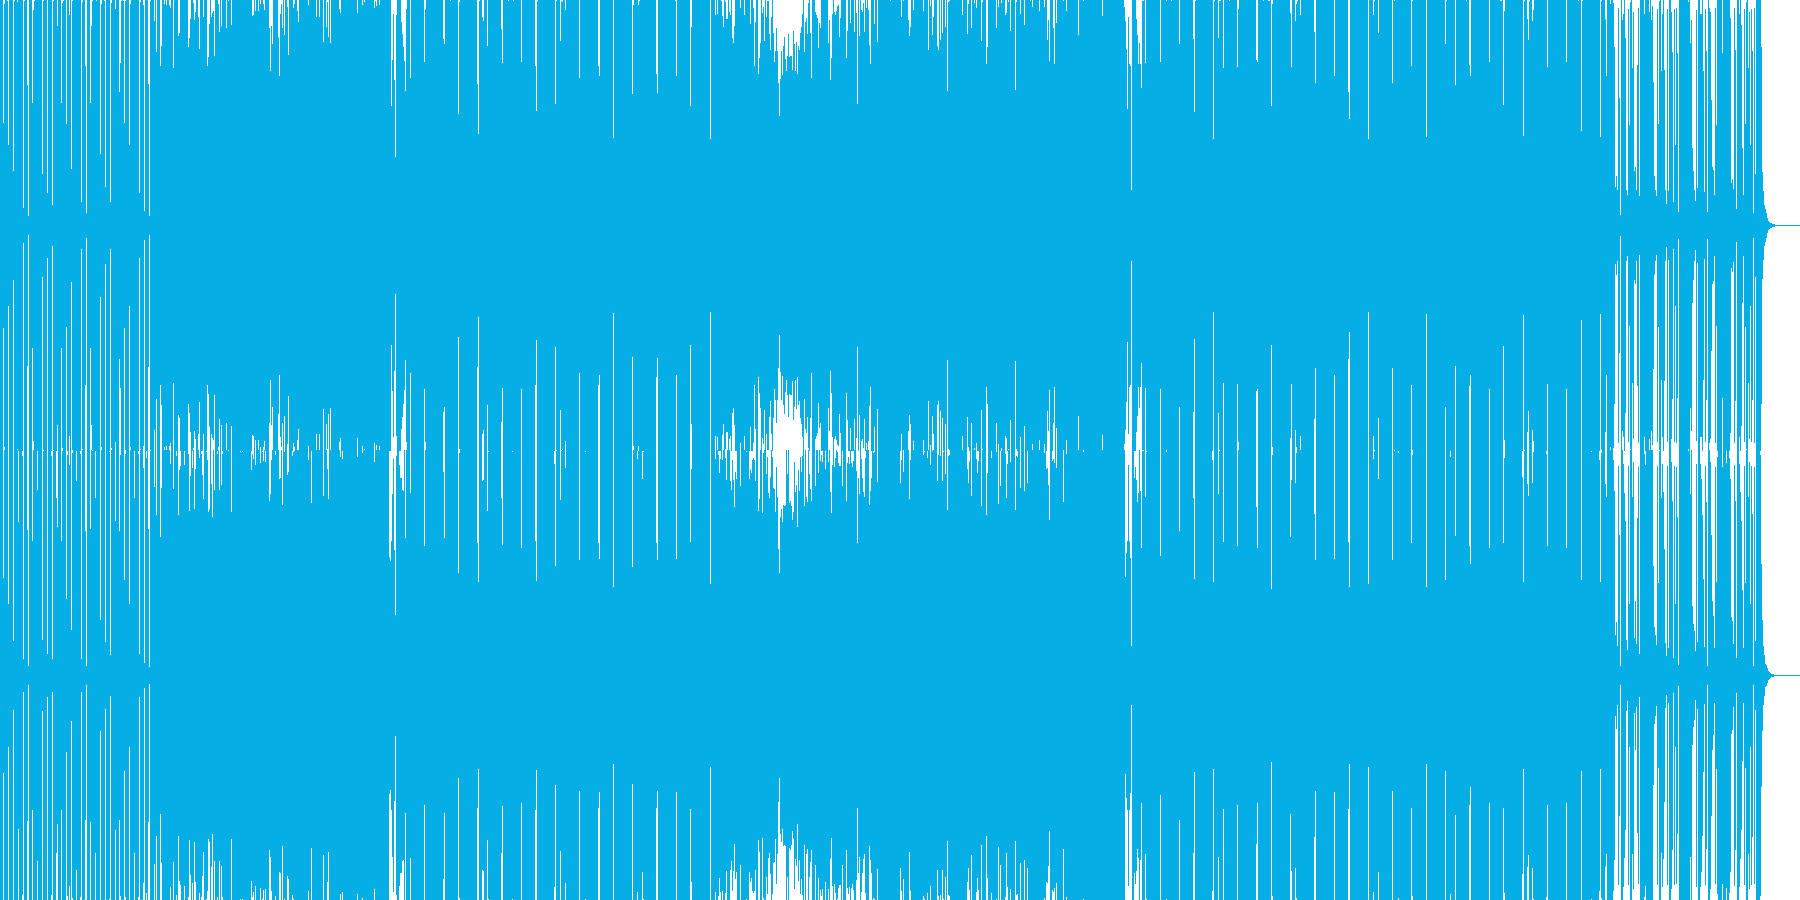 EDMクラブ系ダンスミュージック4の再生済みの波形